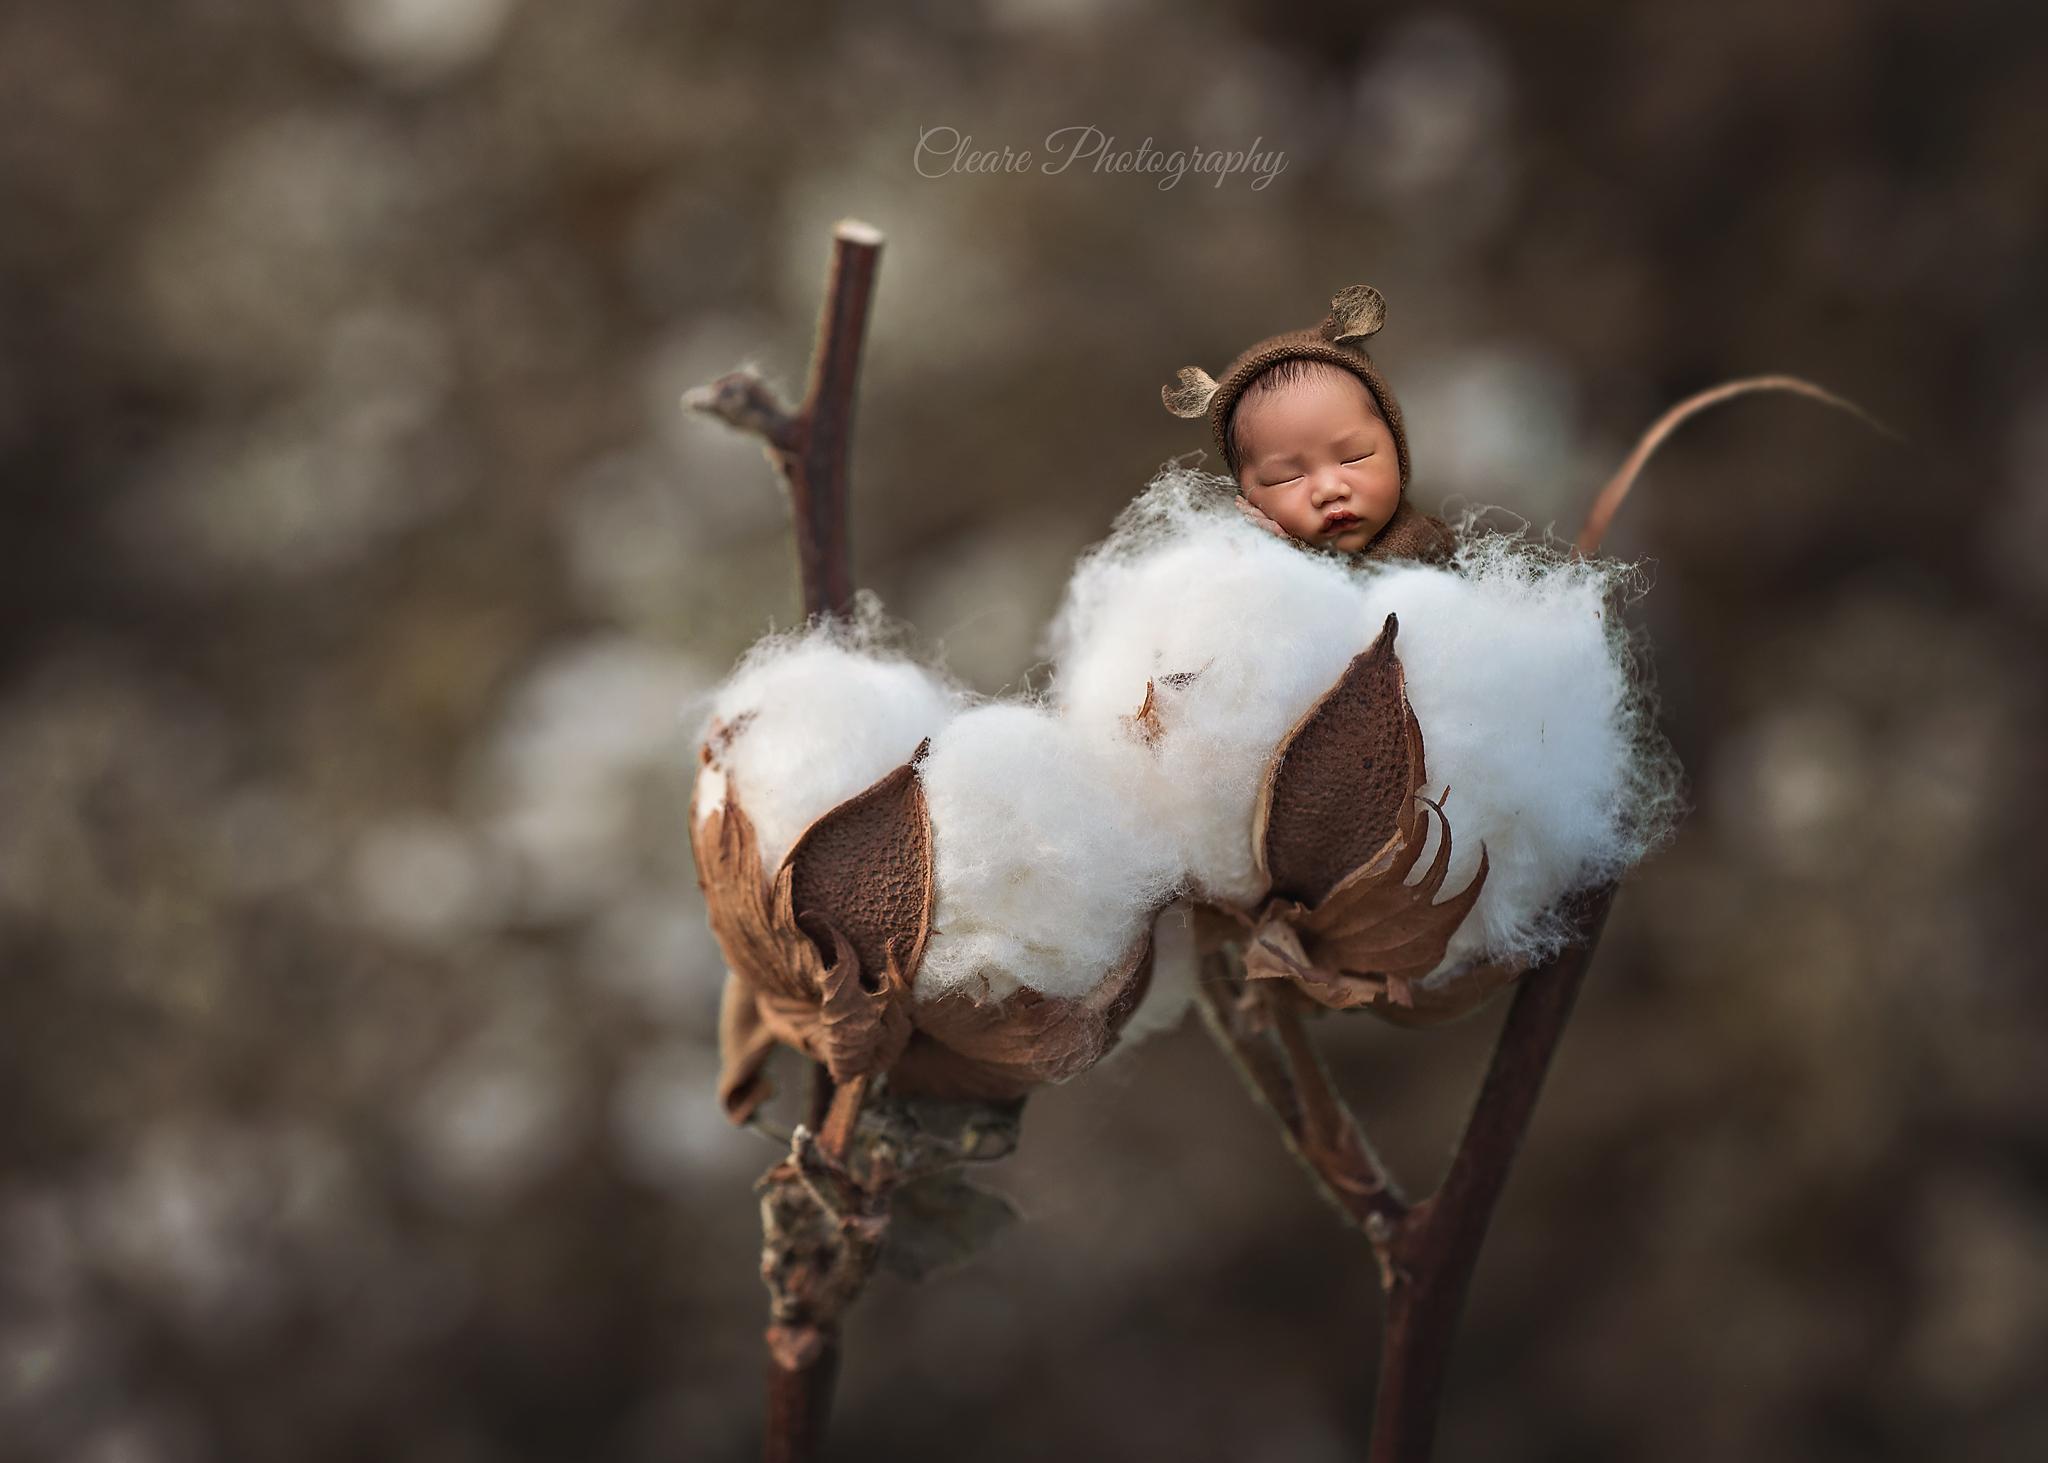 Mom Captures Magic of Life Through Newborn Photography